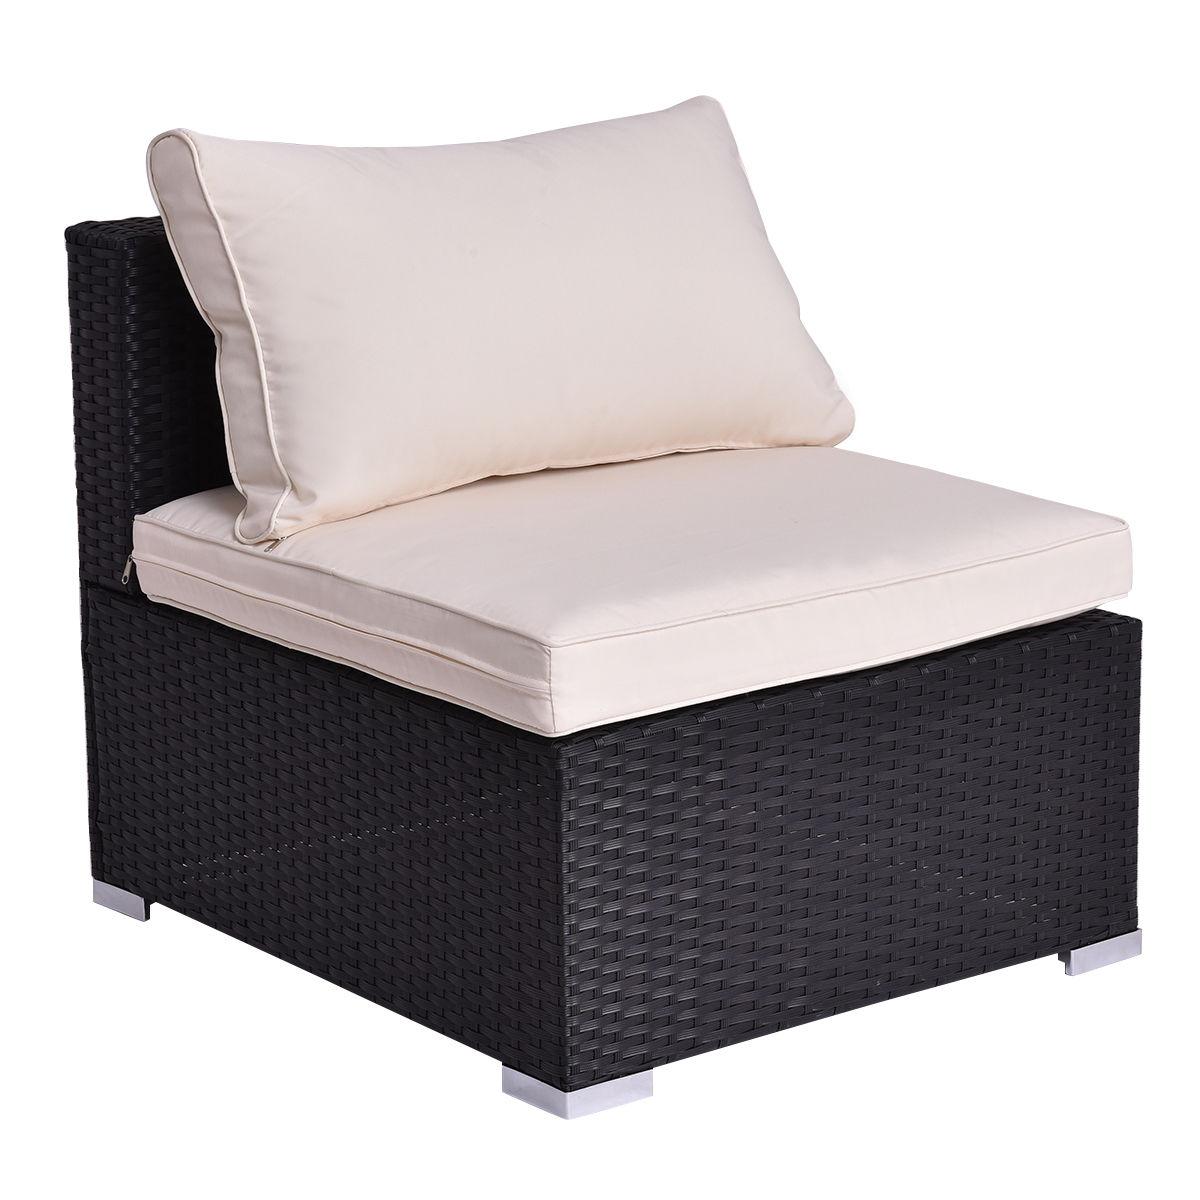 Costway Black Outdoor Patio Rattan Furniture Set Infinitely Combination  Cushion Wicker 4